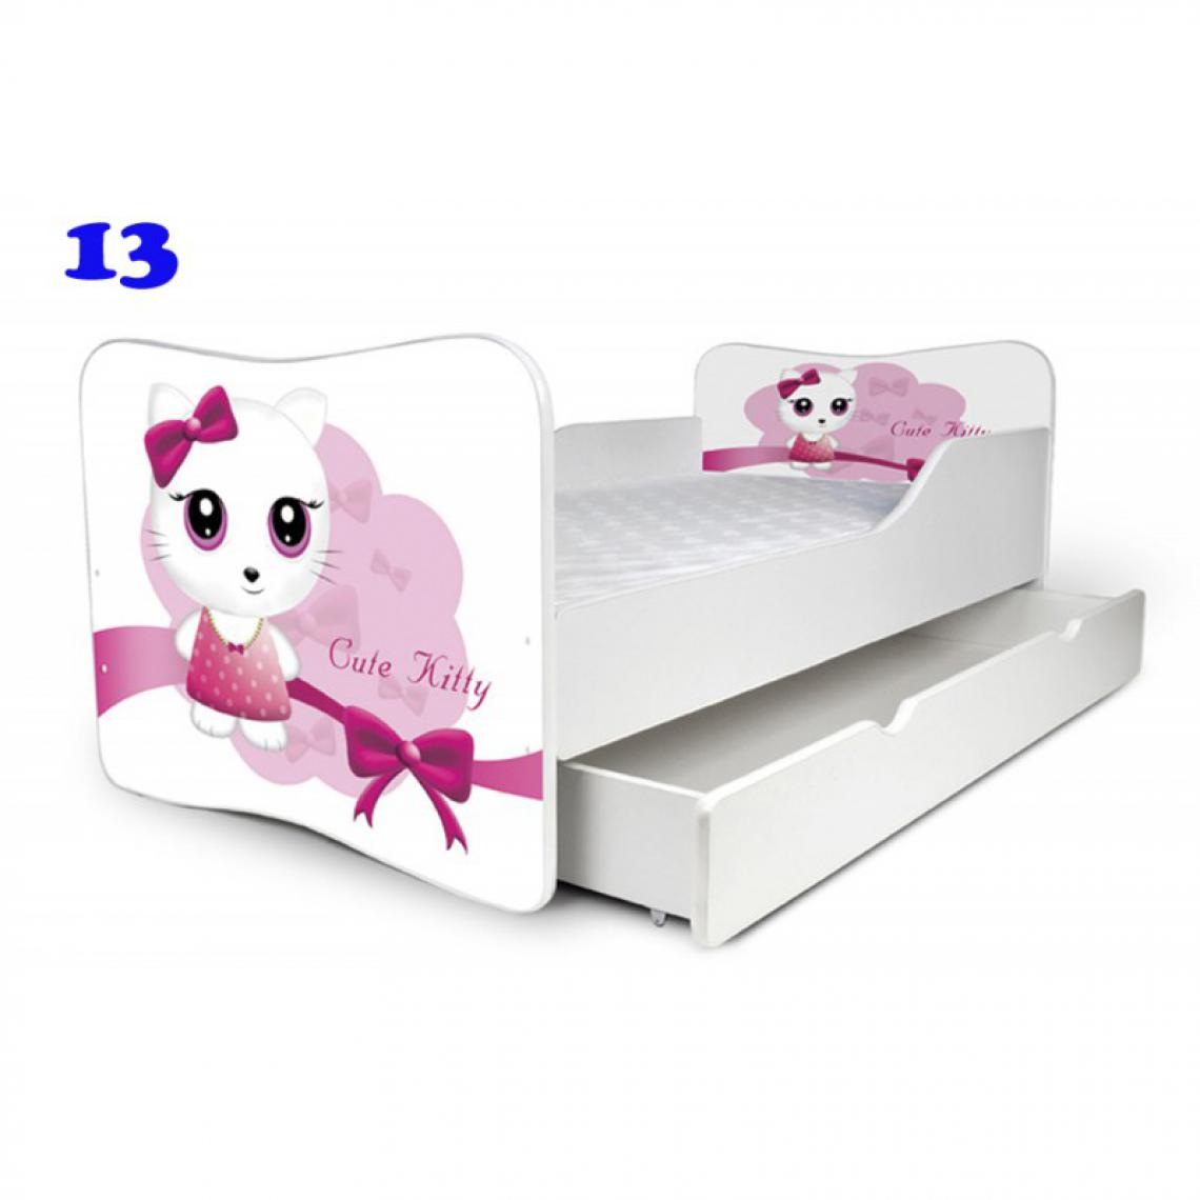 Bim Furniture Lit Enfant 180x80 cm avec Tiroir Cute Kitty Blanc avec sommier et matelas